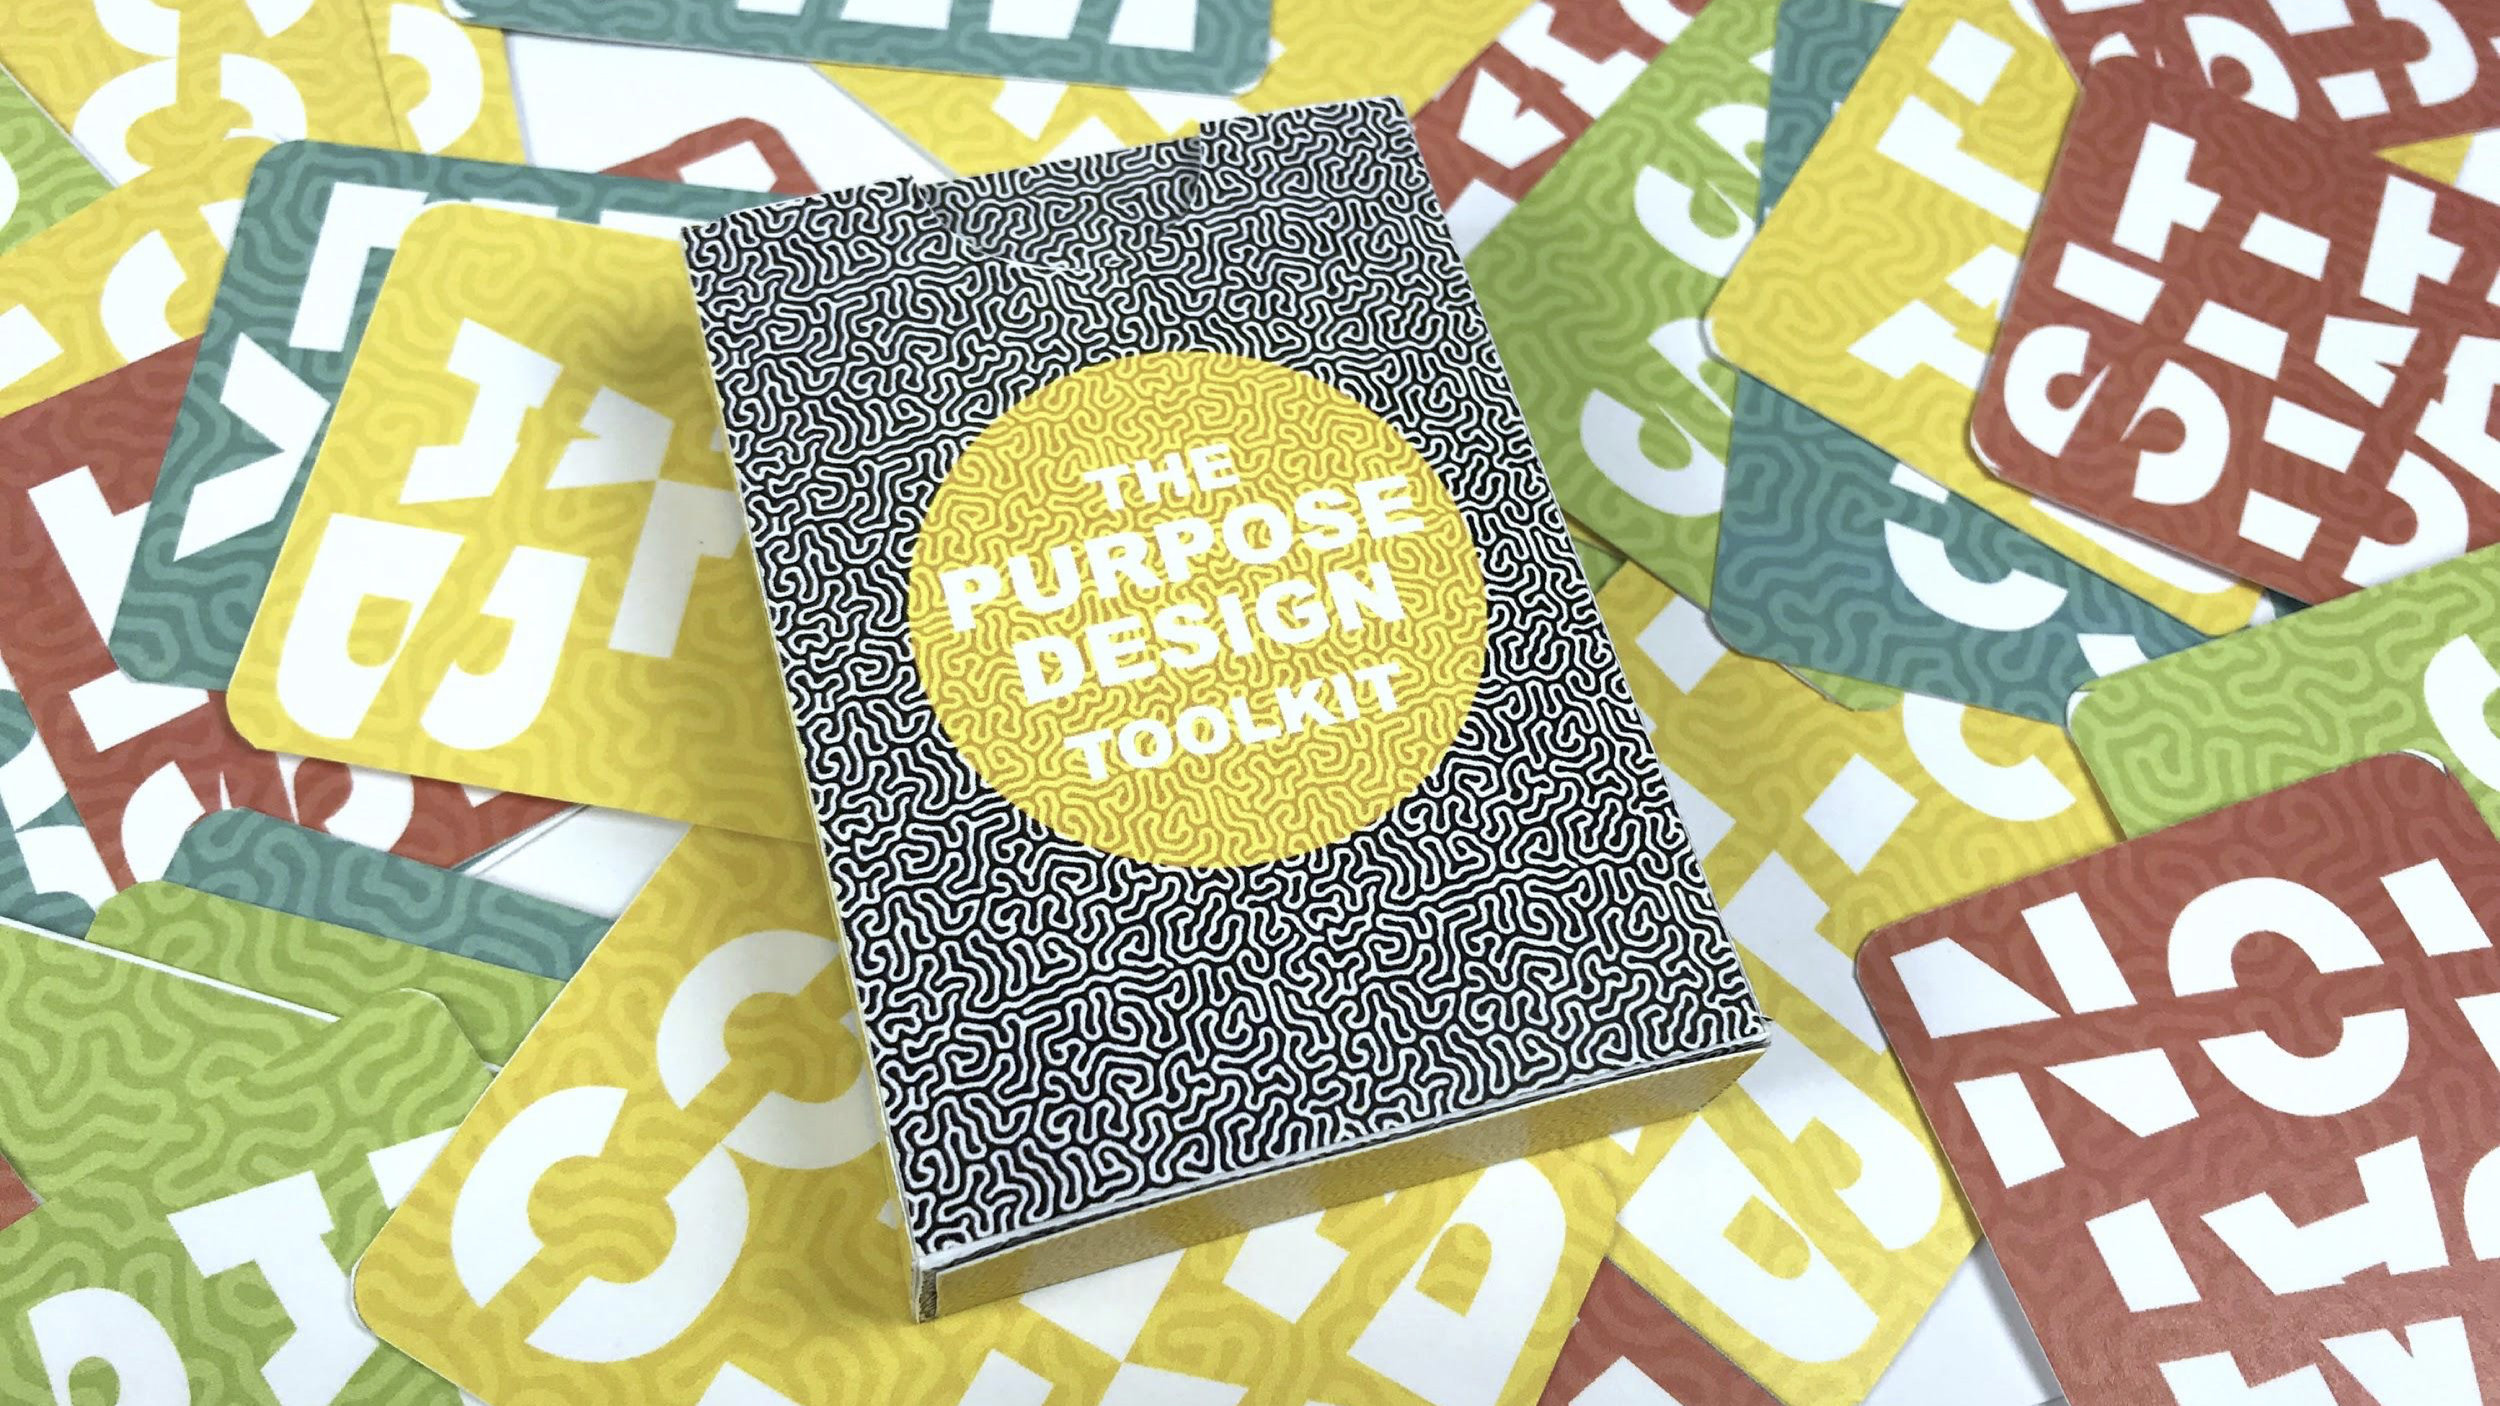 Purpose Design Final Slideshow24.jpg